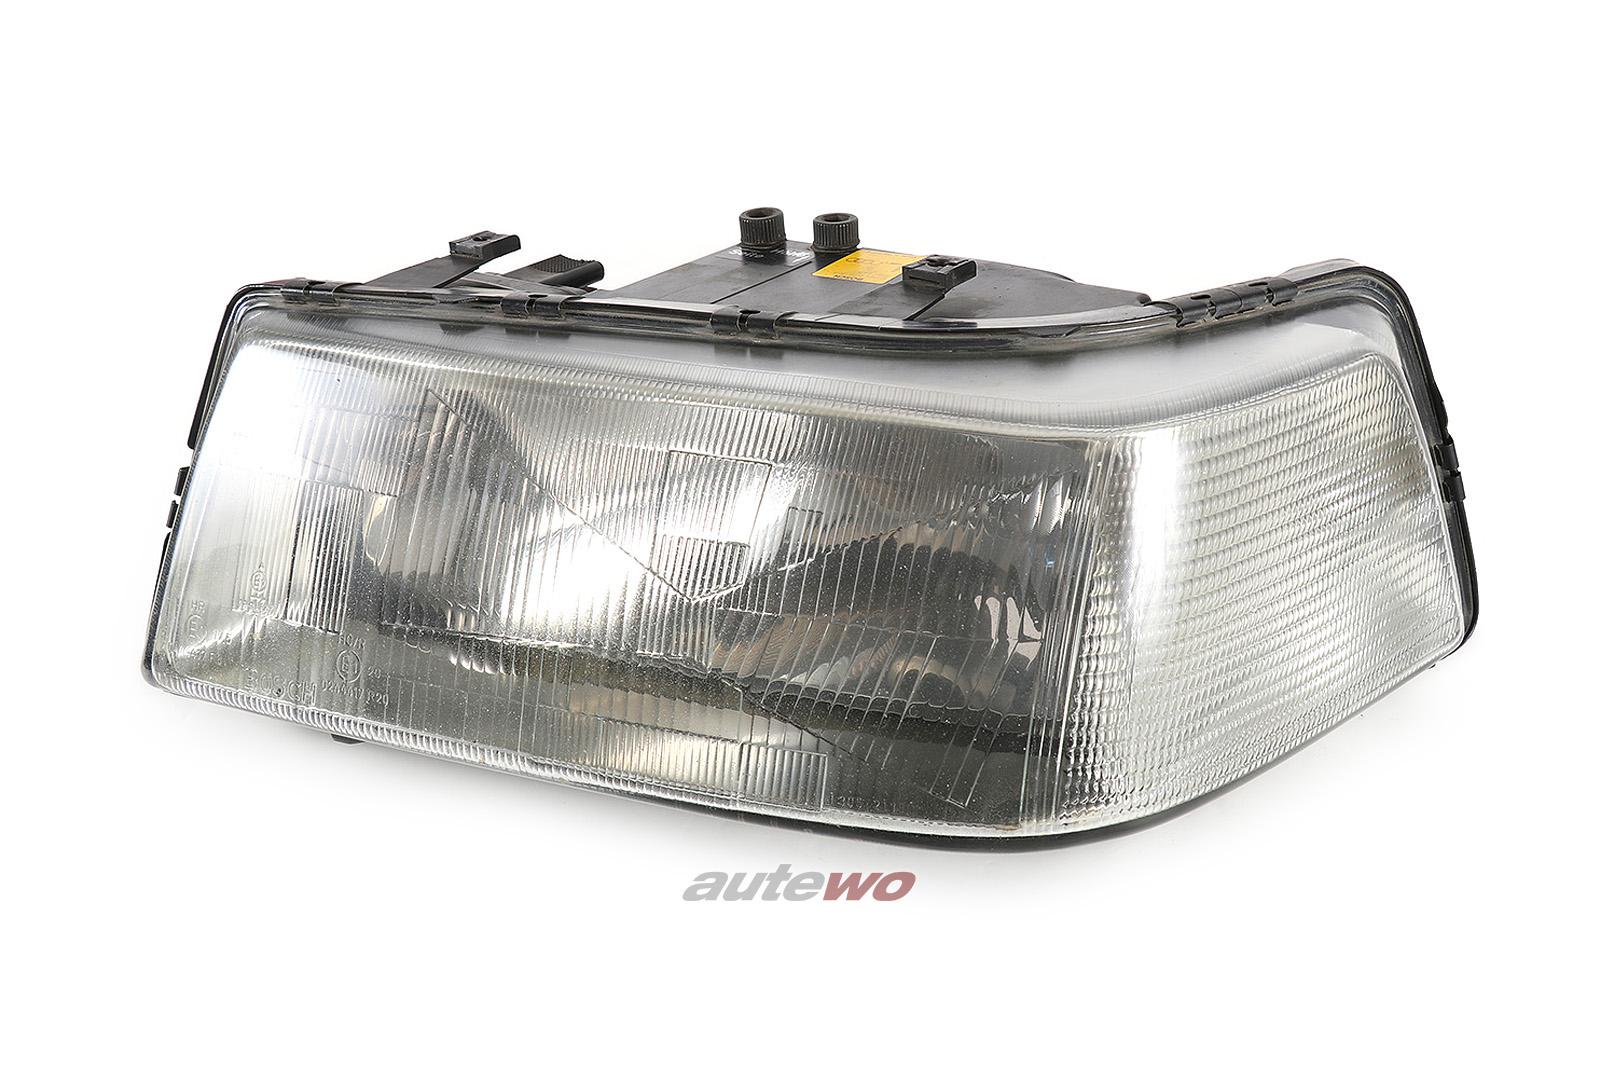 441941003B 441941029 Bosch 0301079309 Audi V8 D11 Halogenscheinwerfer Links